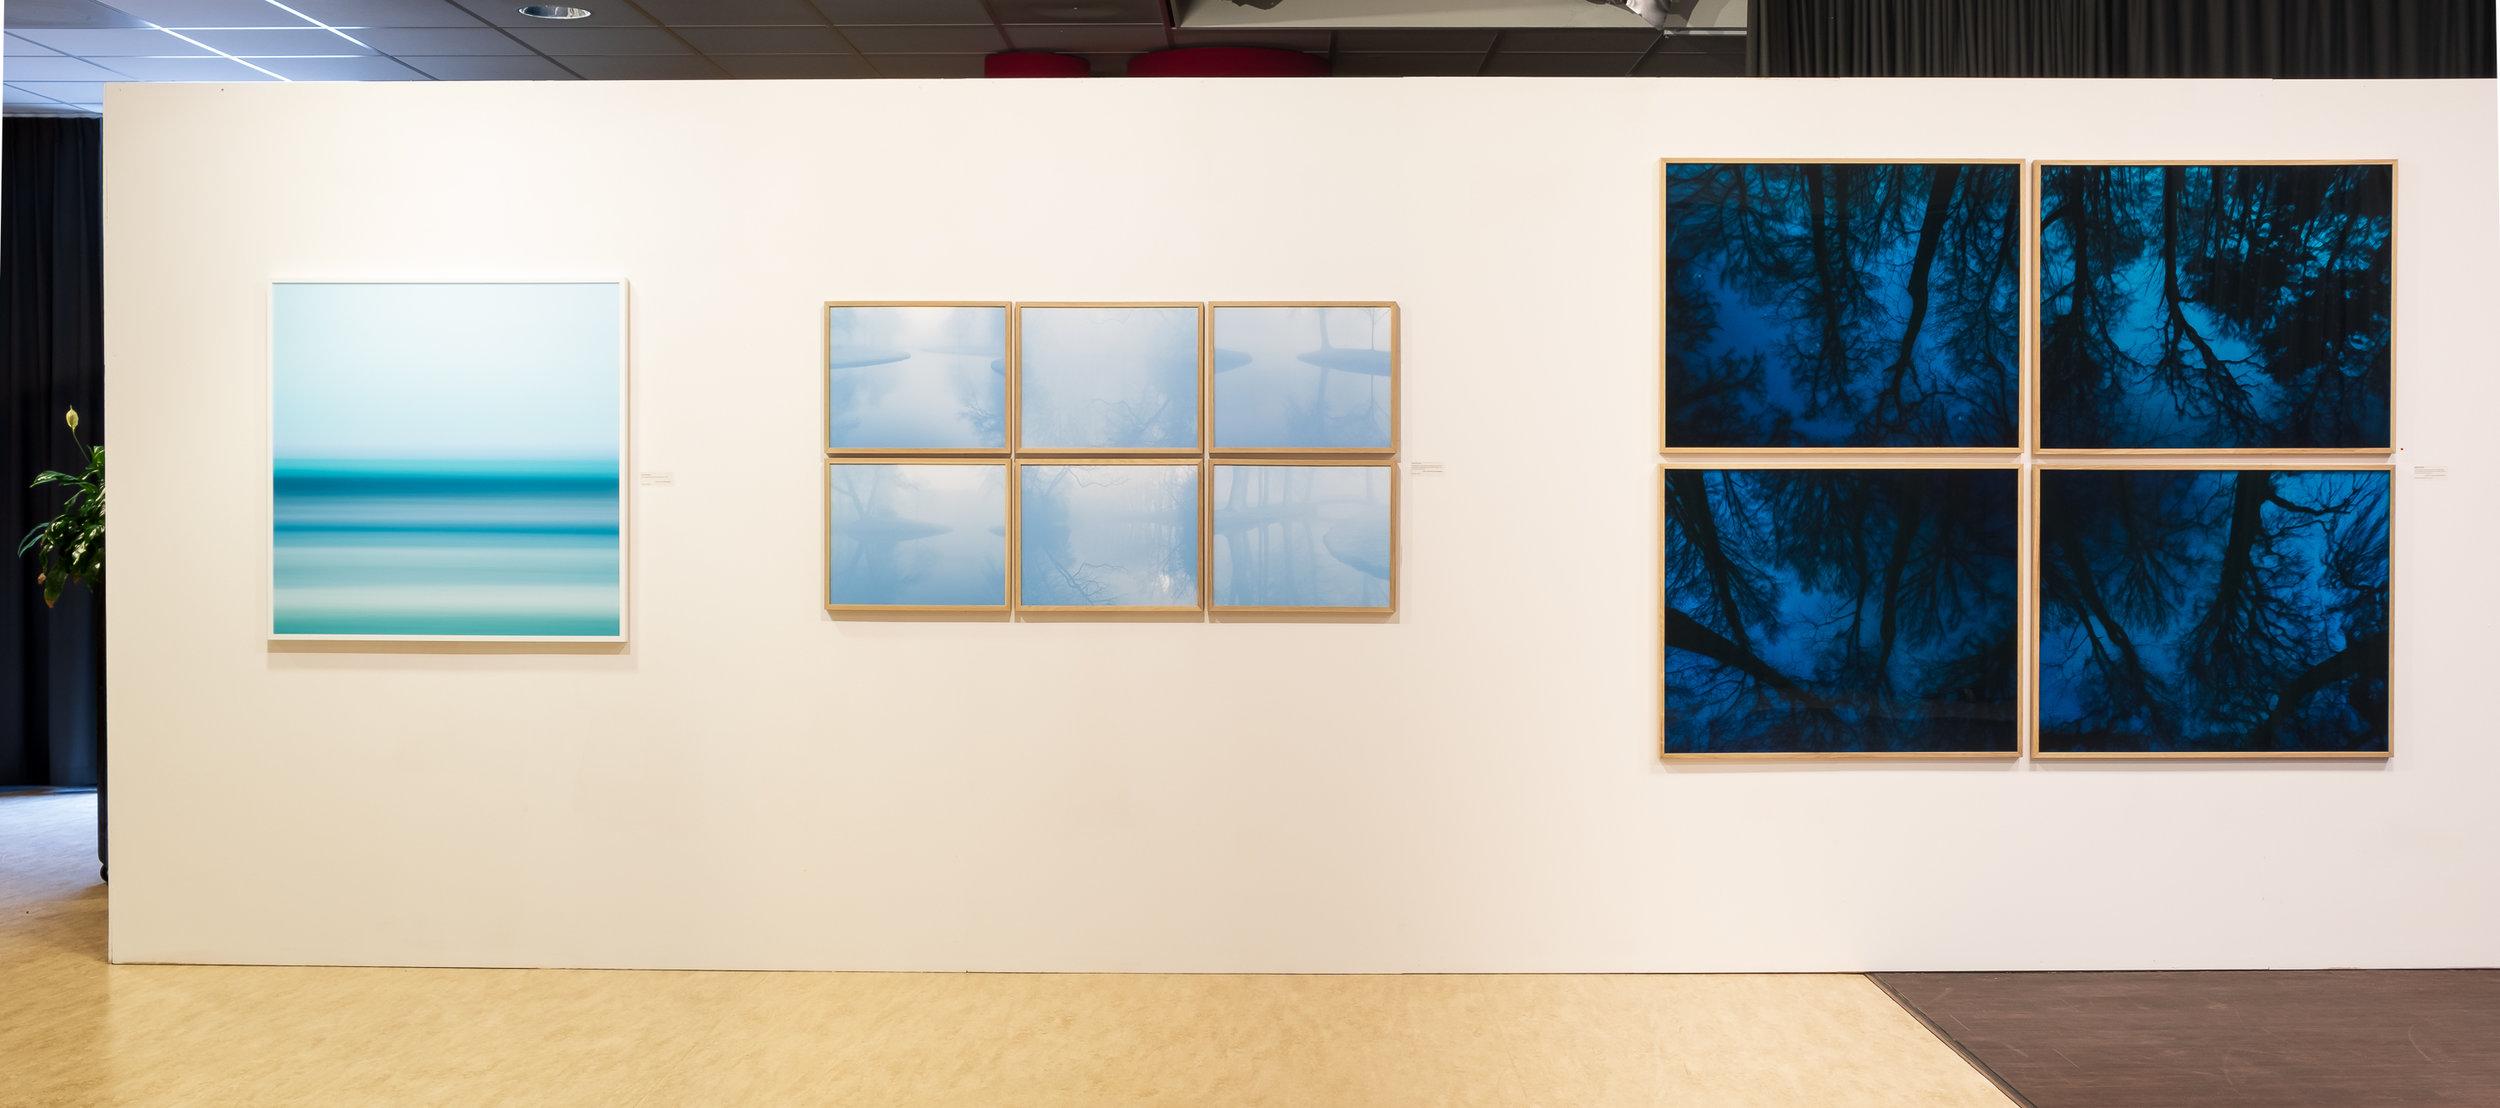 Solo exhibition Kunstroute Open Stal 2019, art route in Oldeberkoop, NL